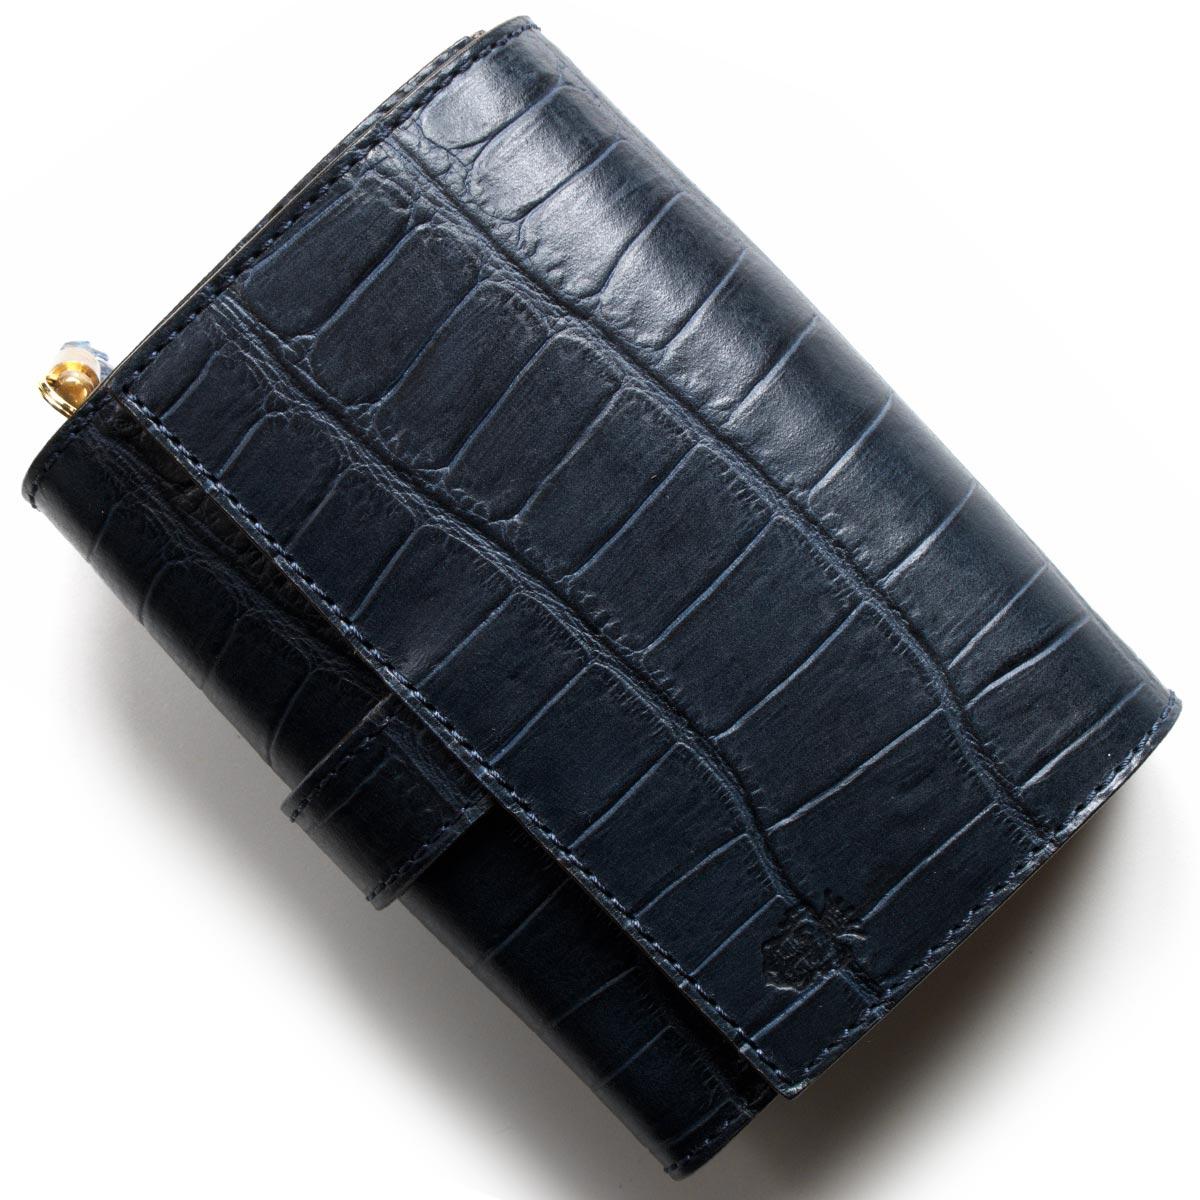 a036878403fd フェリージ二つ折り財布財布メンズレディースクロコ型押しネイビーブルー3500SA0005FELISI フェリージ セレクト